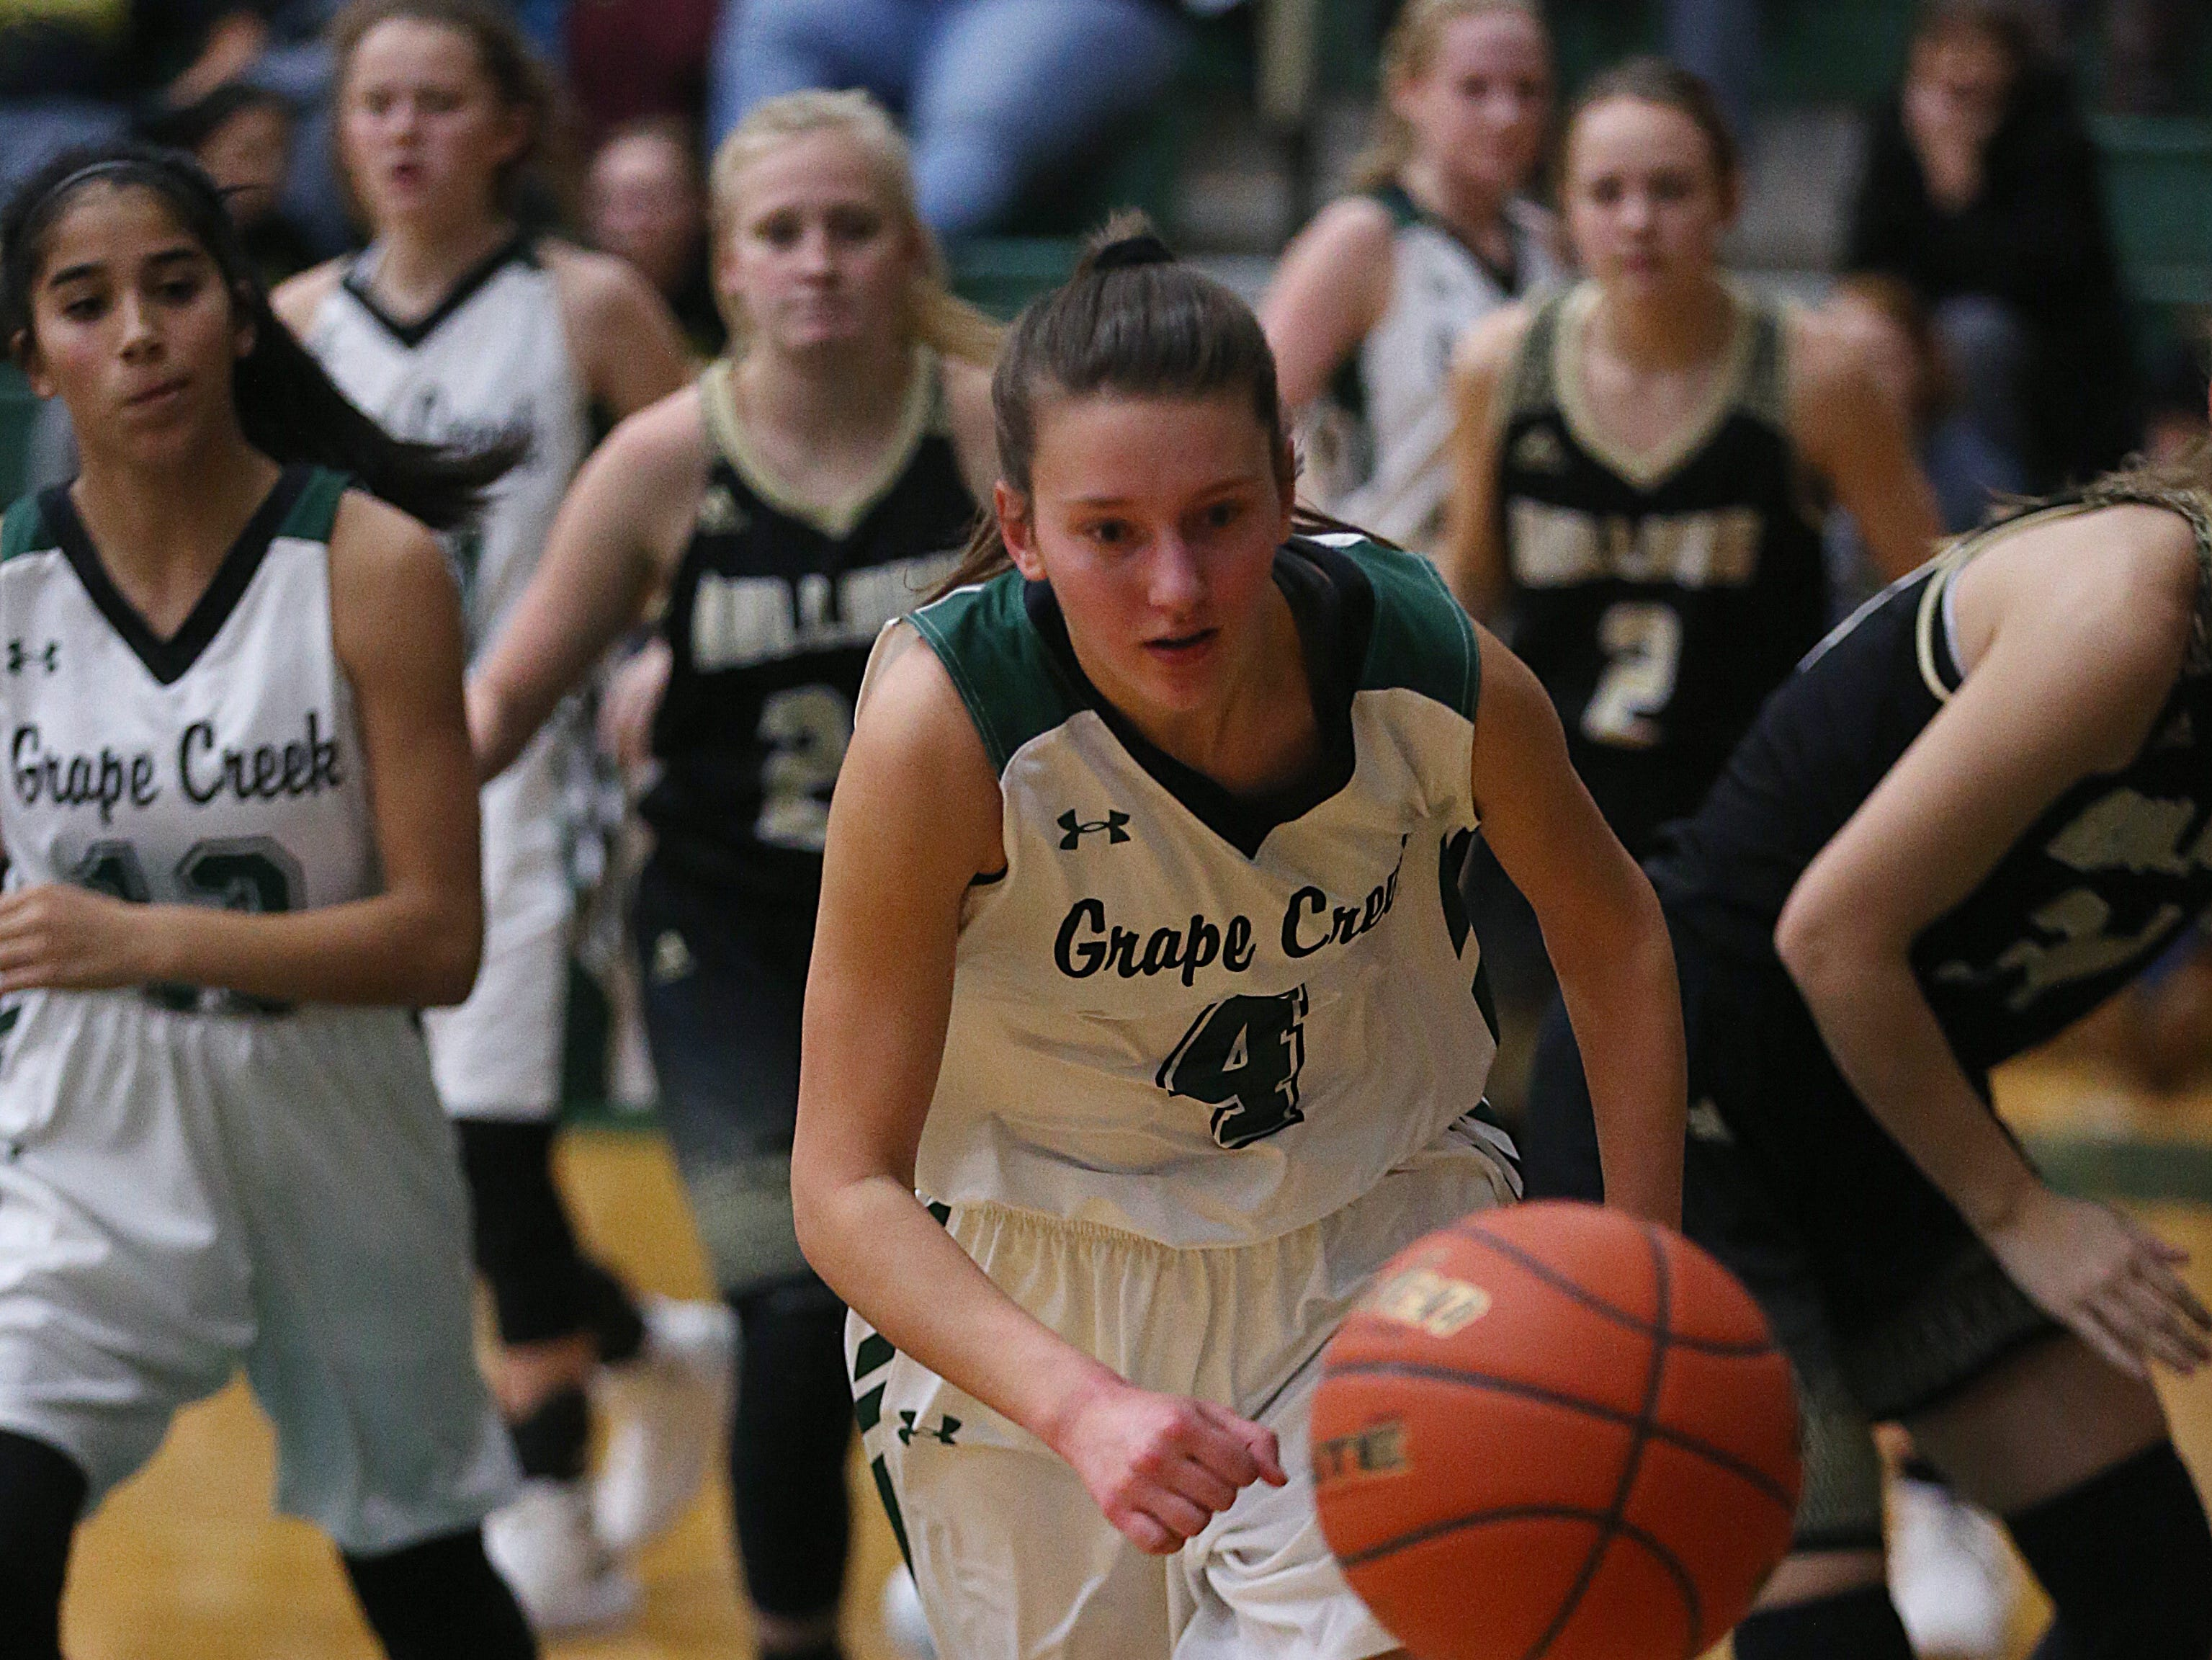 Grape Creek's Rachel Porter (#4) tries to regain control of the ball Friday, Dec. 14, 2018 during their game against Brady in Grape Creek. Brady won 48 to 28.